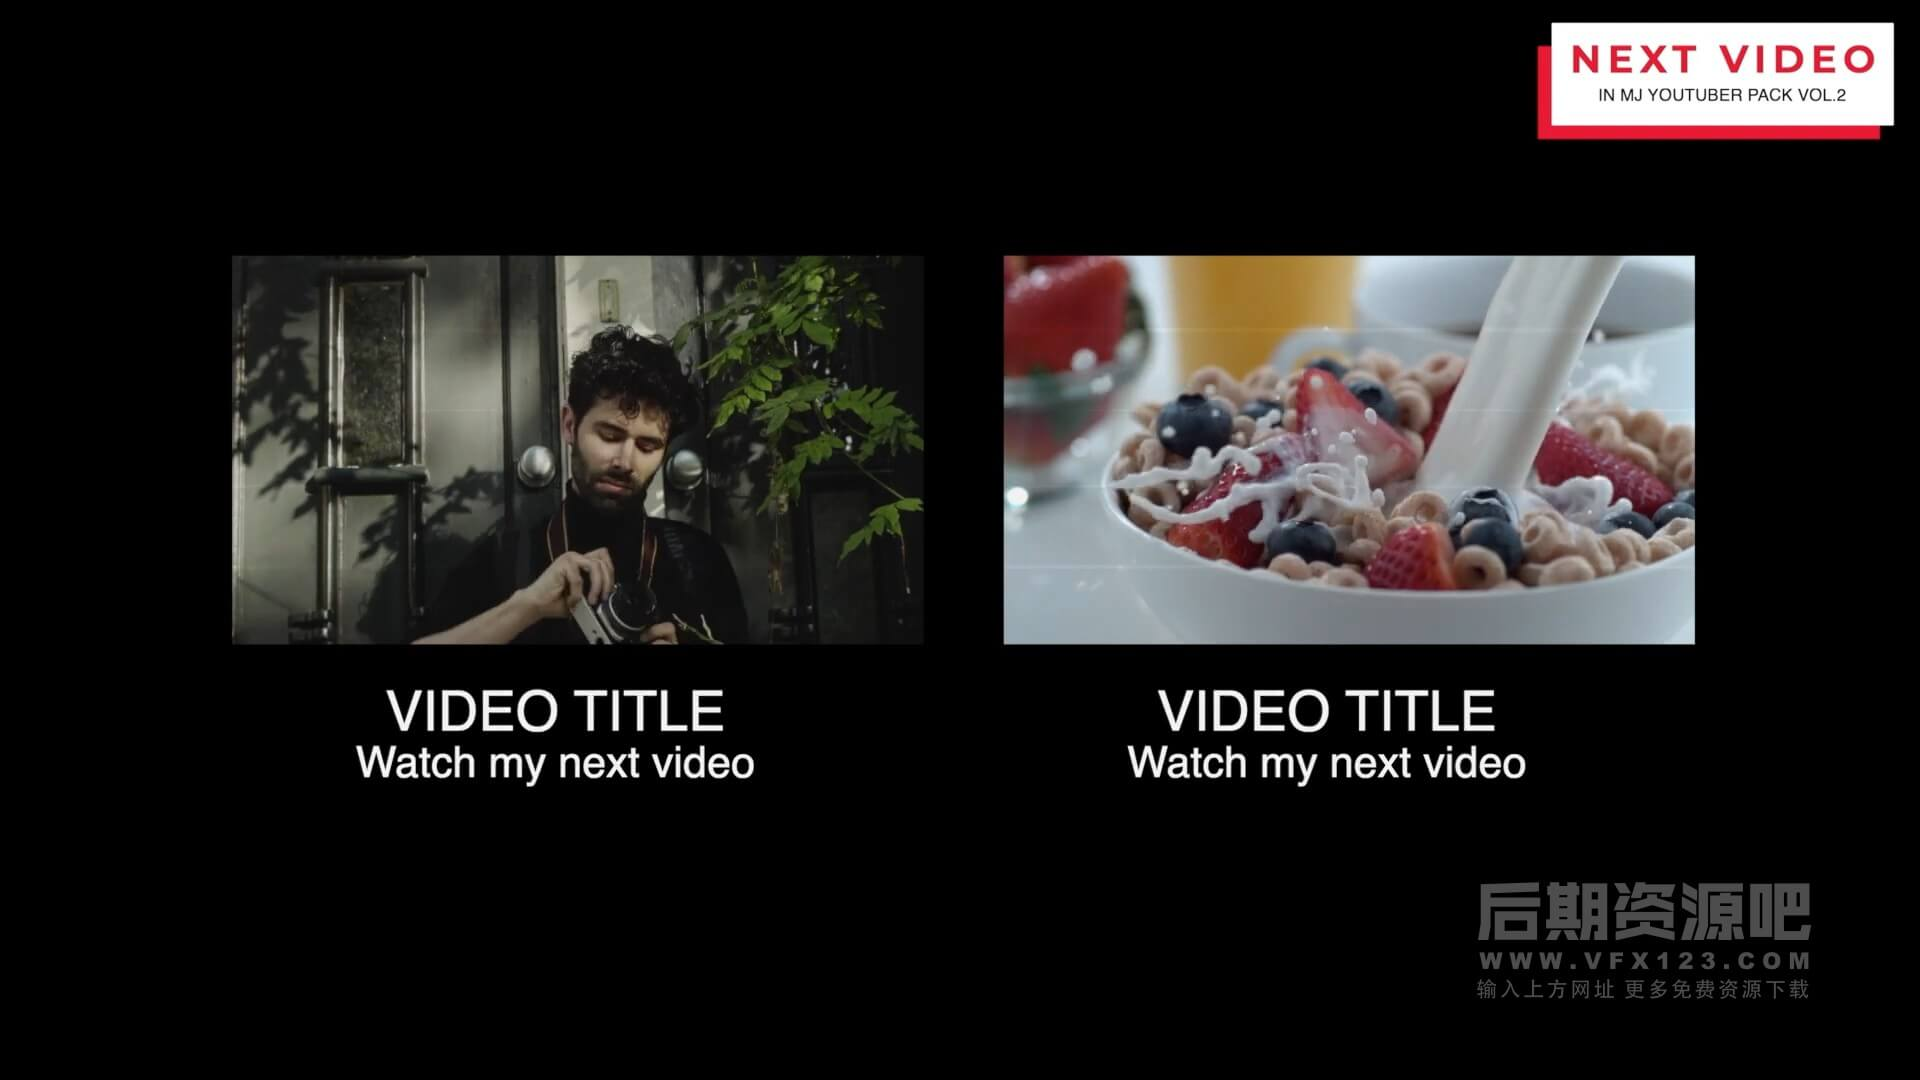 fcpx插件 自媒体短视频博主影片制作工具包 第二季 标题+转场+点赞+预告